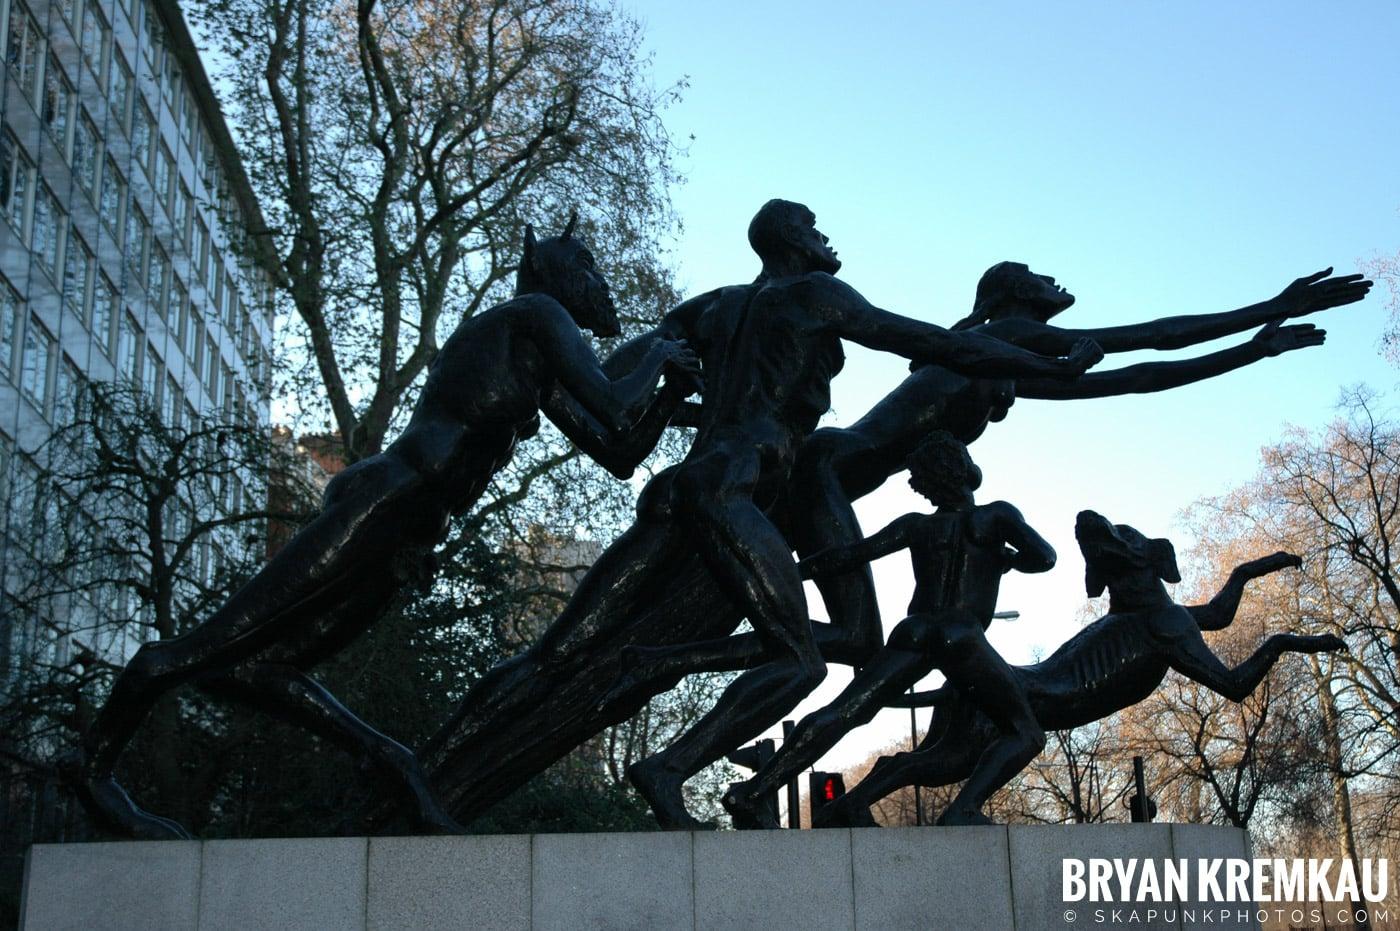 London, England - Day 3 - 12.18.05 (36)